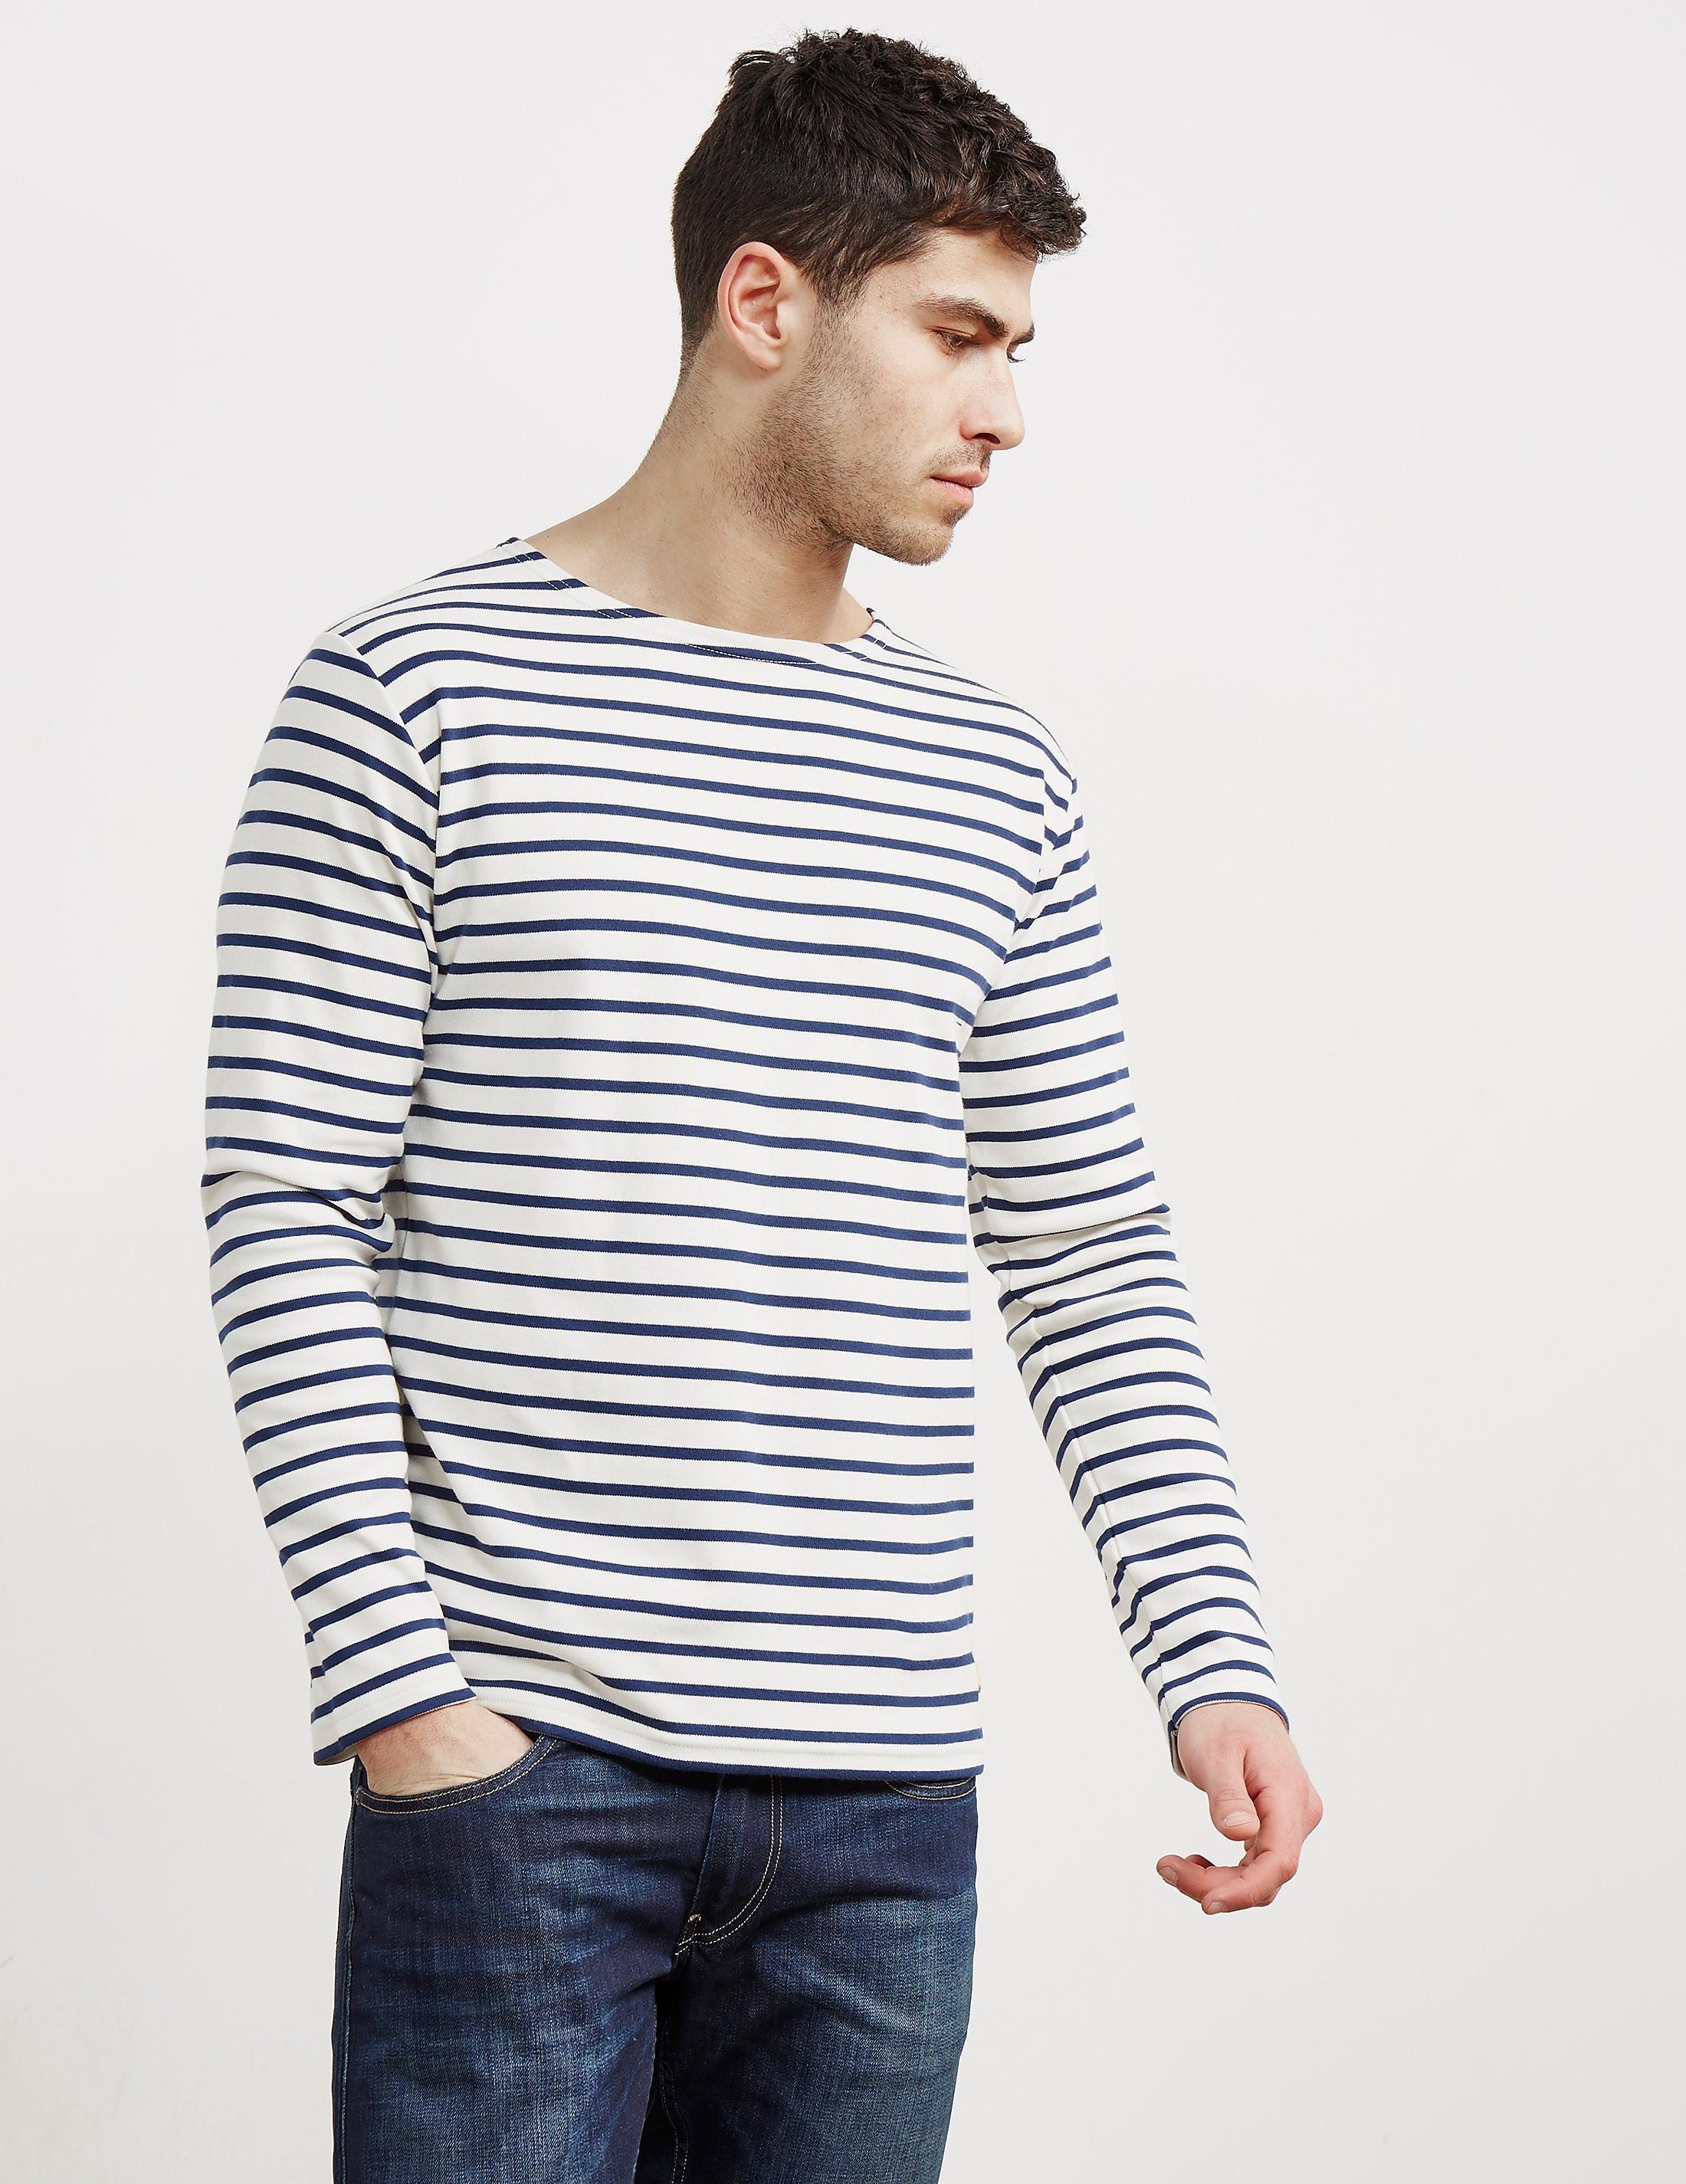 Armor Lux Breton Long Sleeve T-Shirt